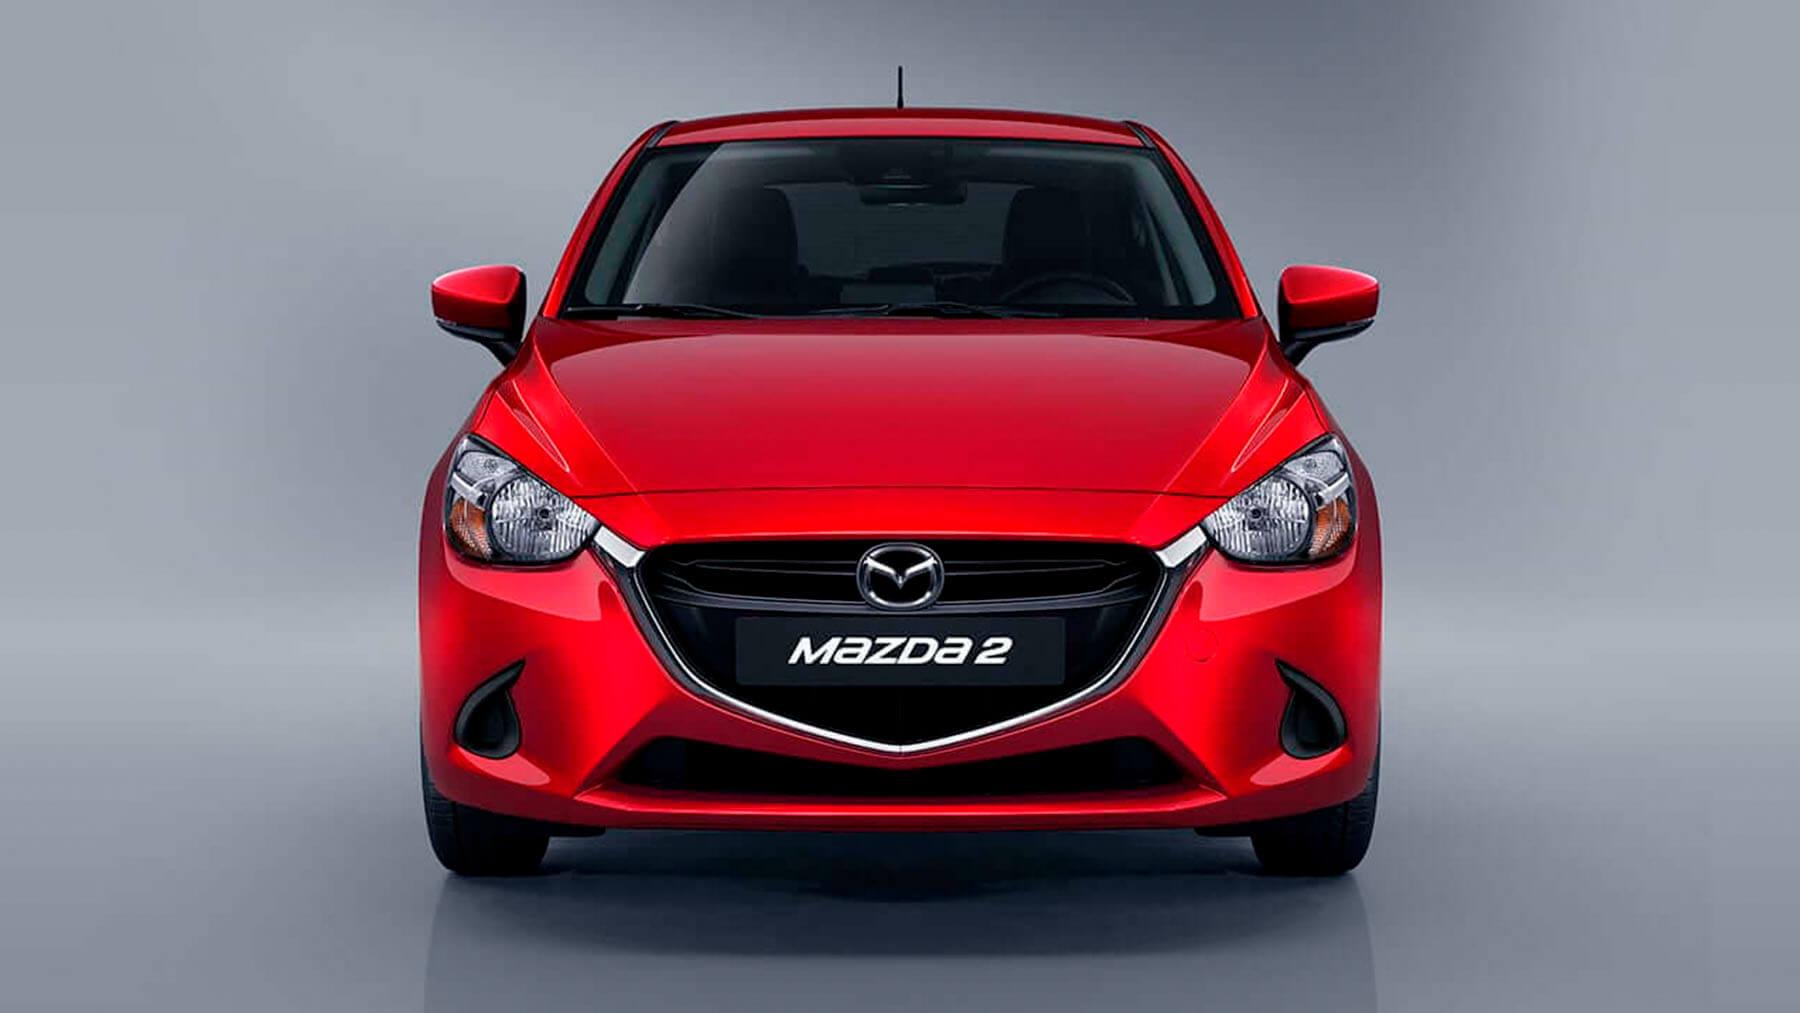 Galeria - Mazda 2 Sport